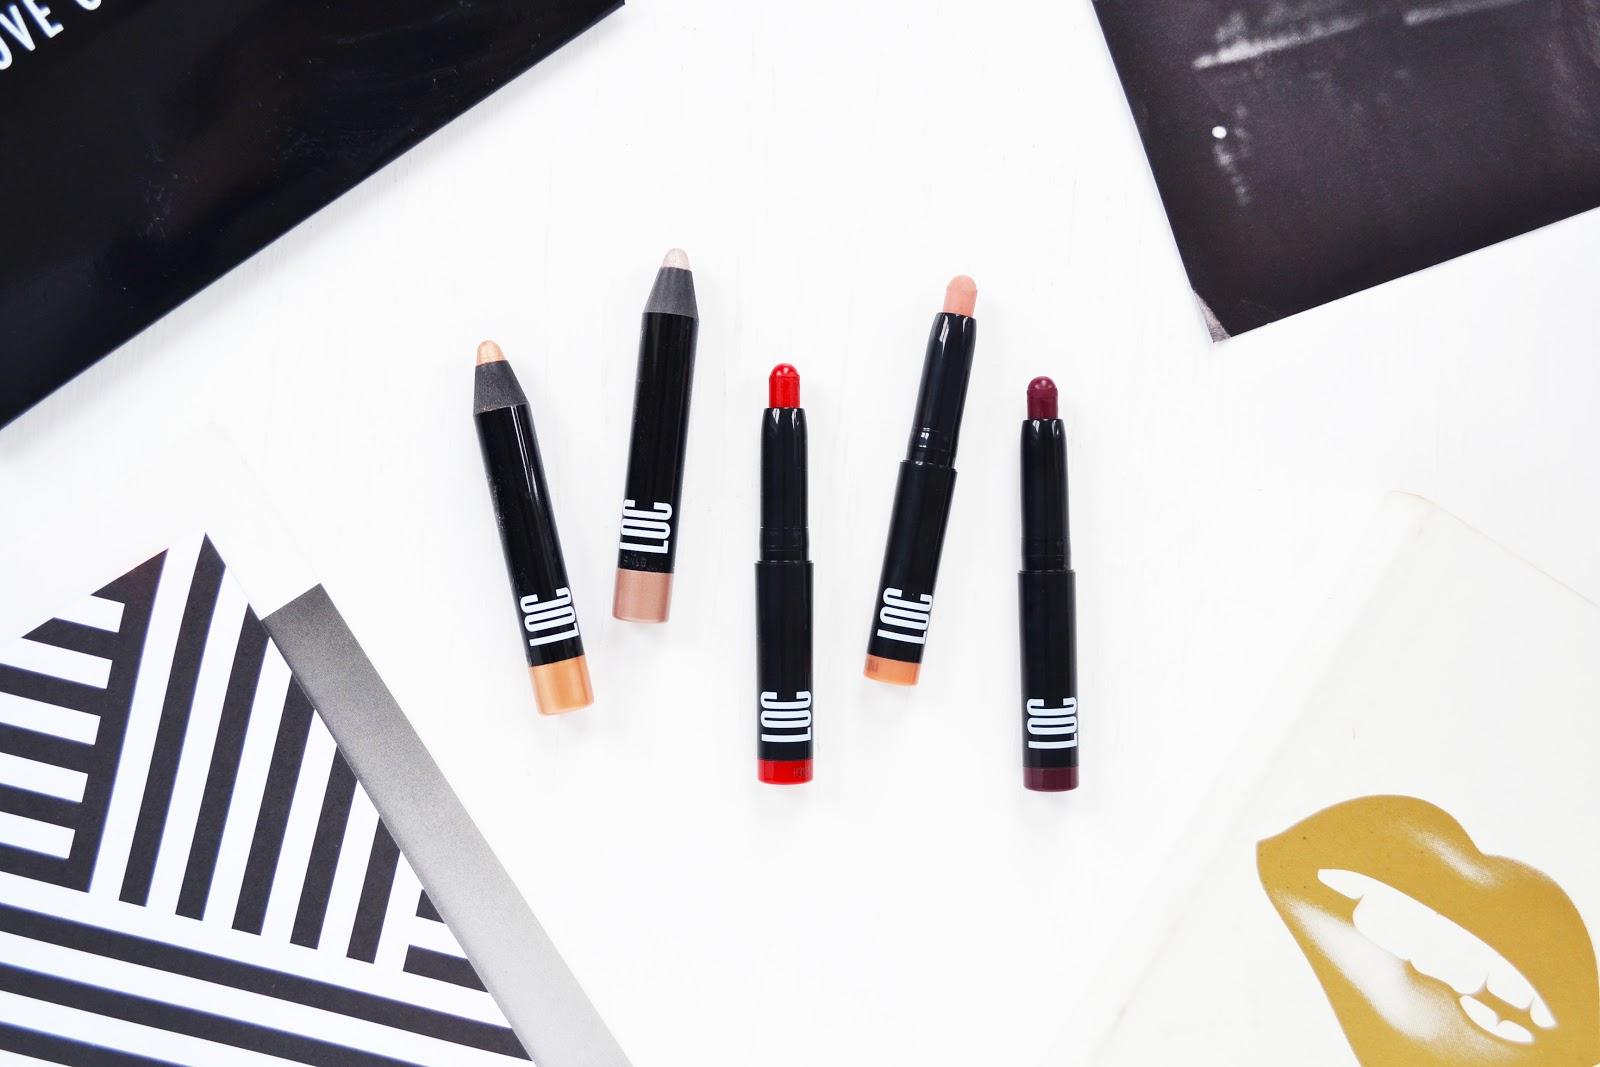 Birchbox UK Releases Their Own Range Of Make-Up